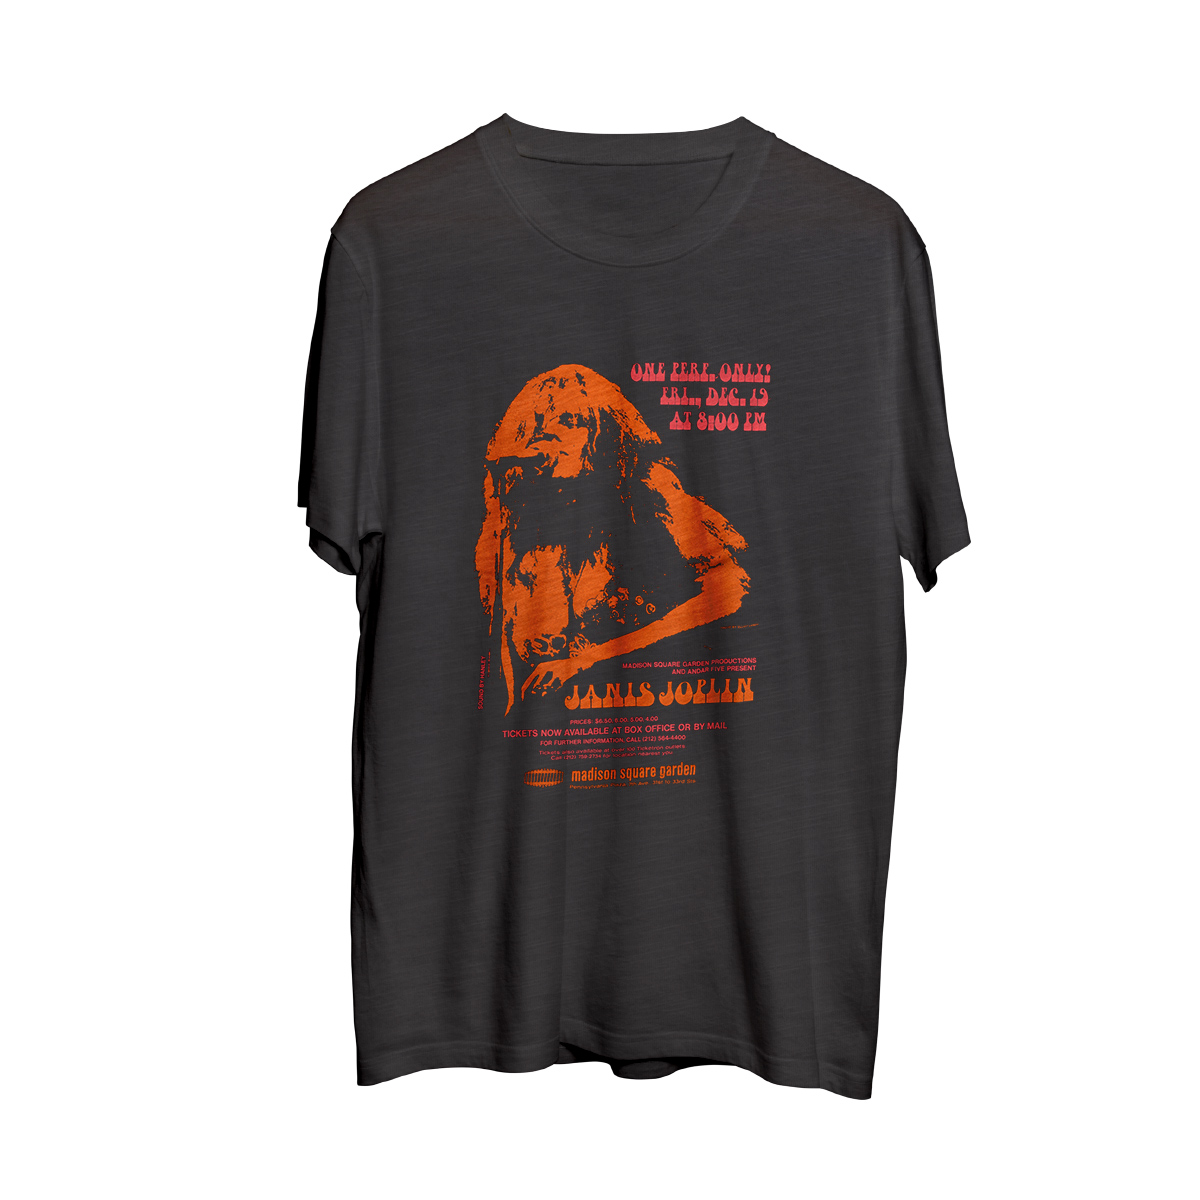 Janis Joplin Madison Square Garden T-Shirt